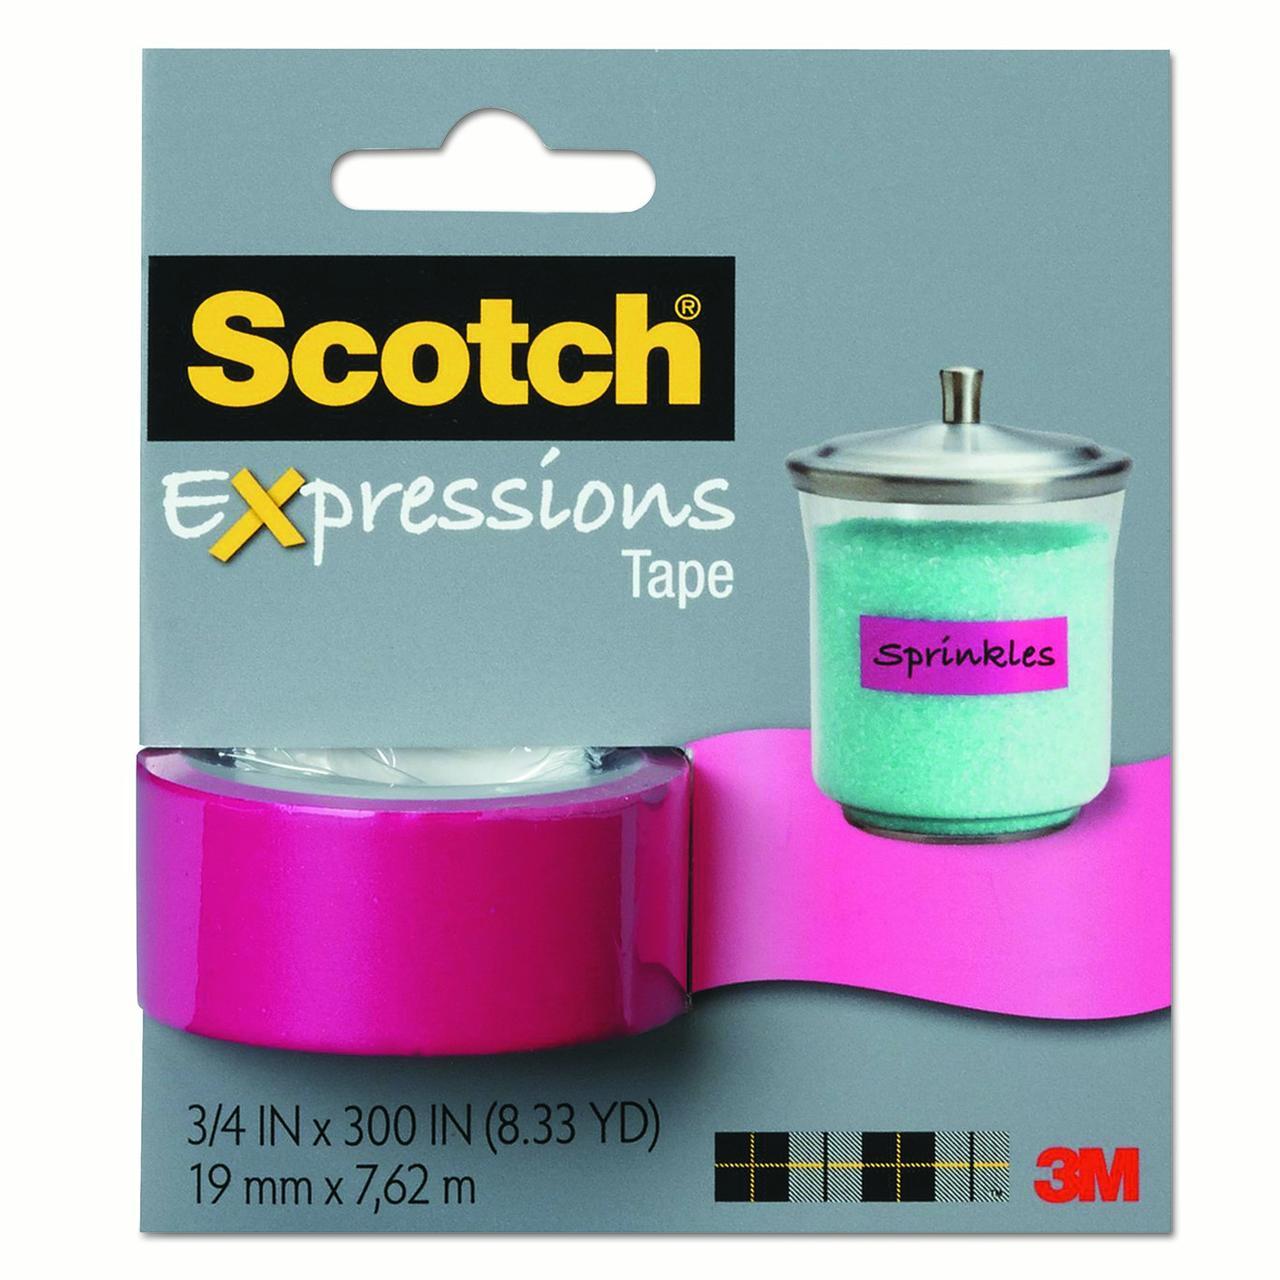 "Scotch Expressions Magic Tape, 3/4"" x 300"", Pink"